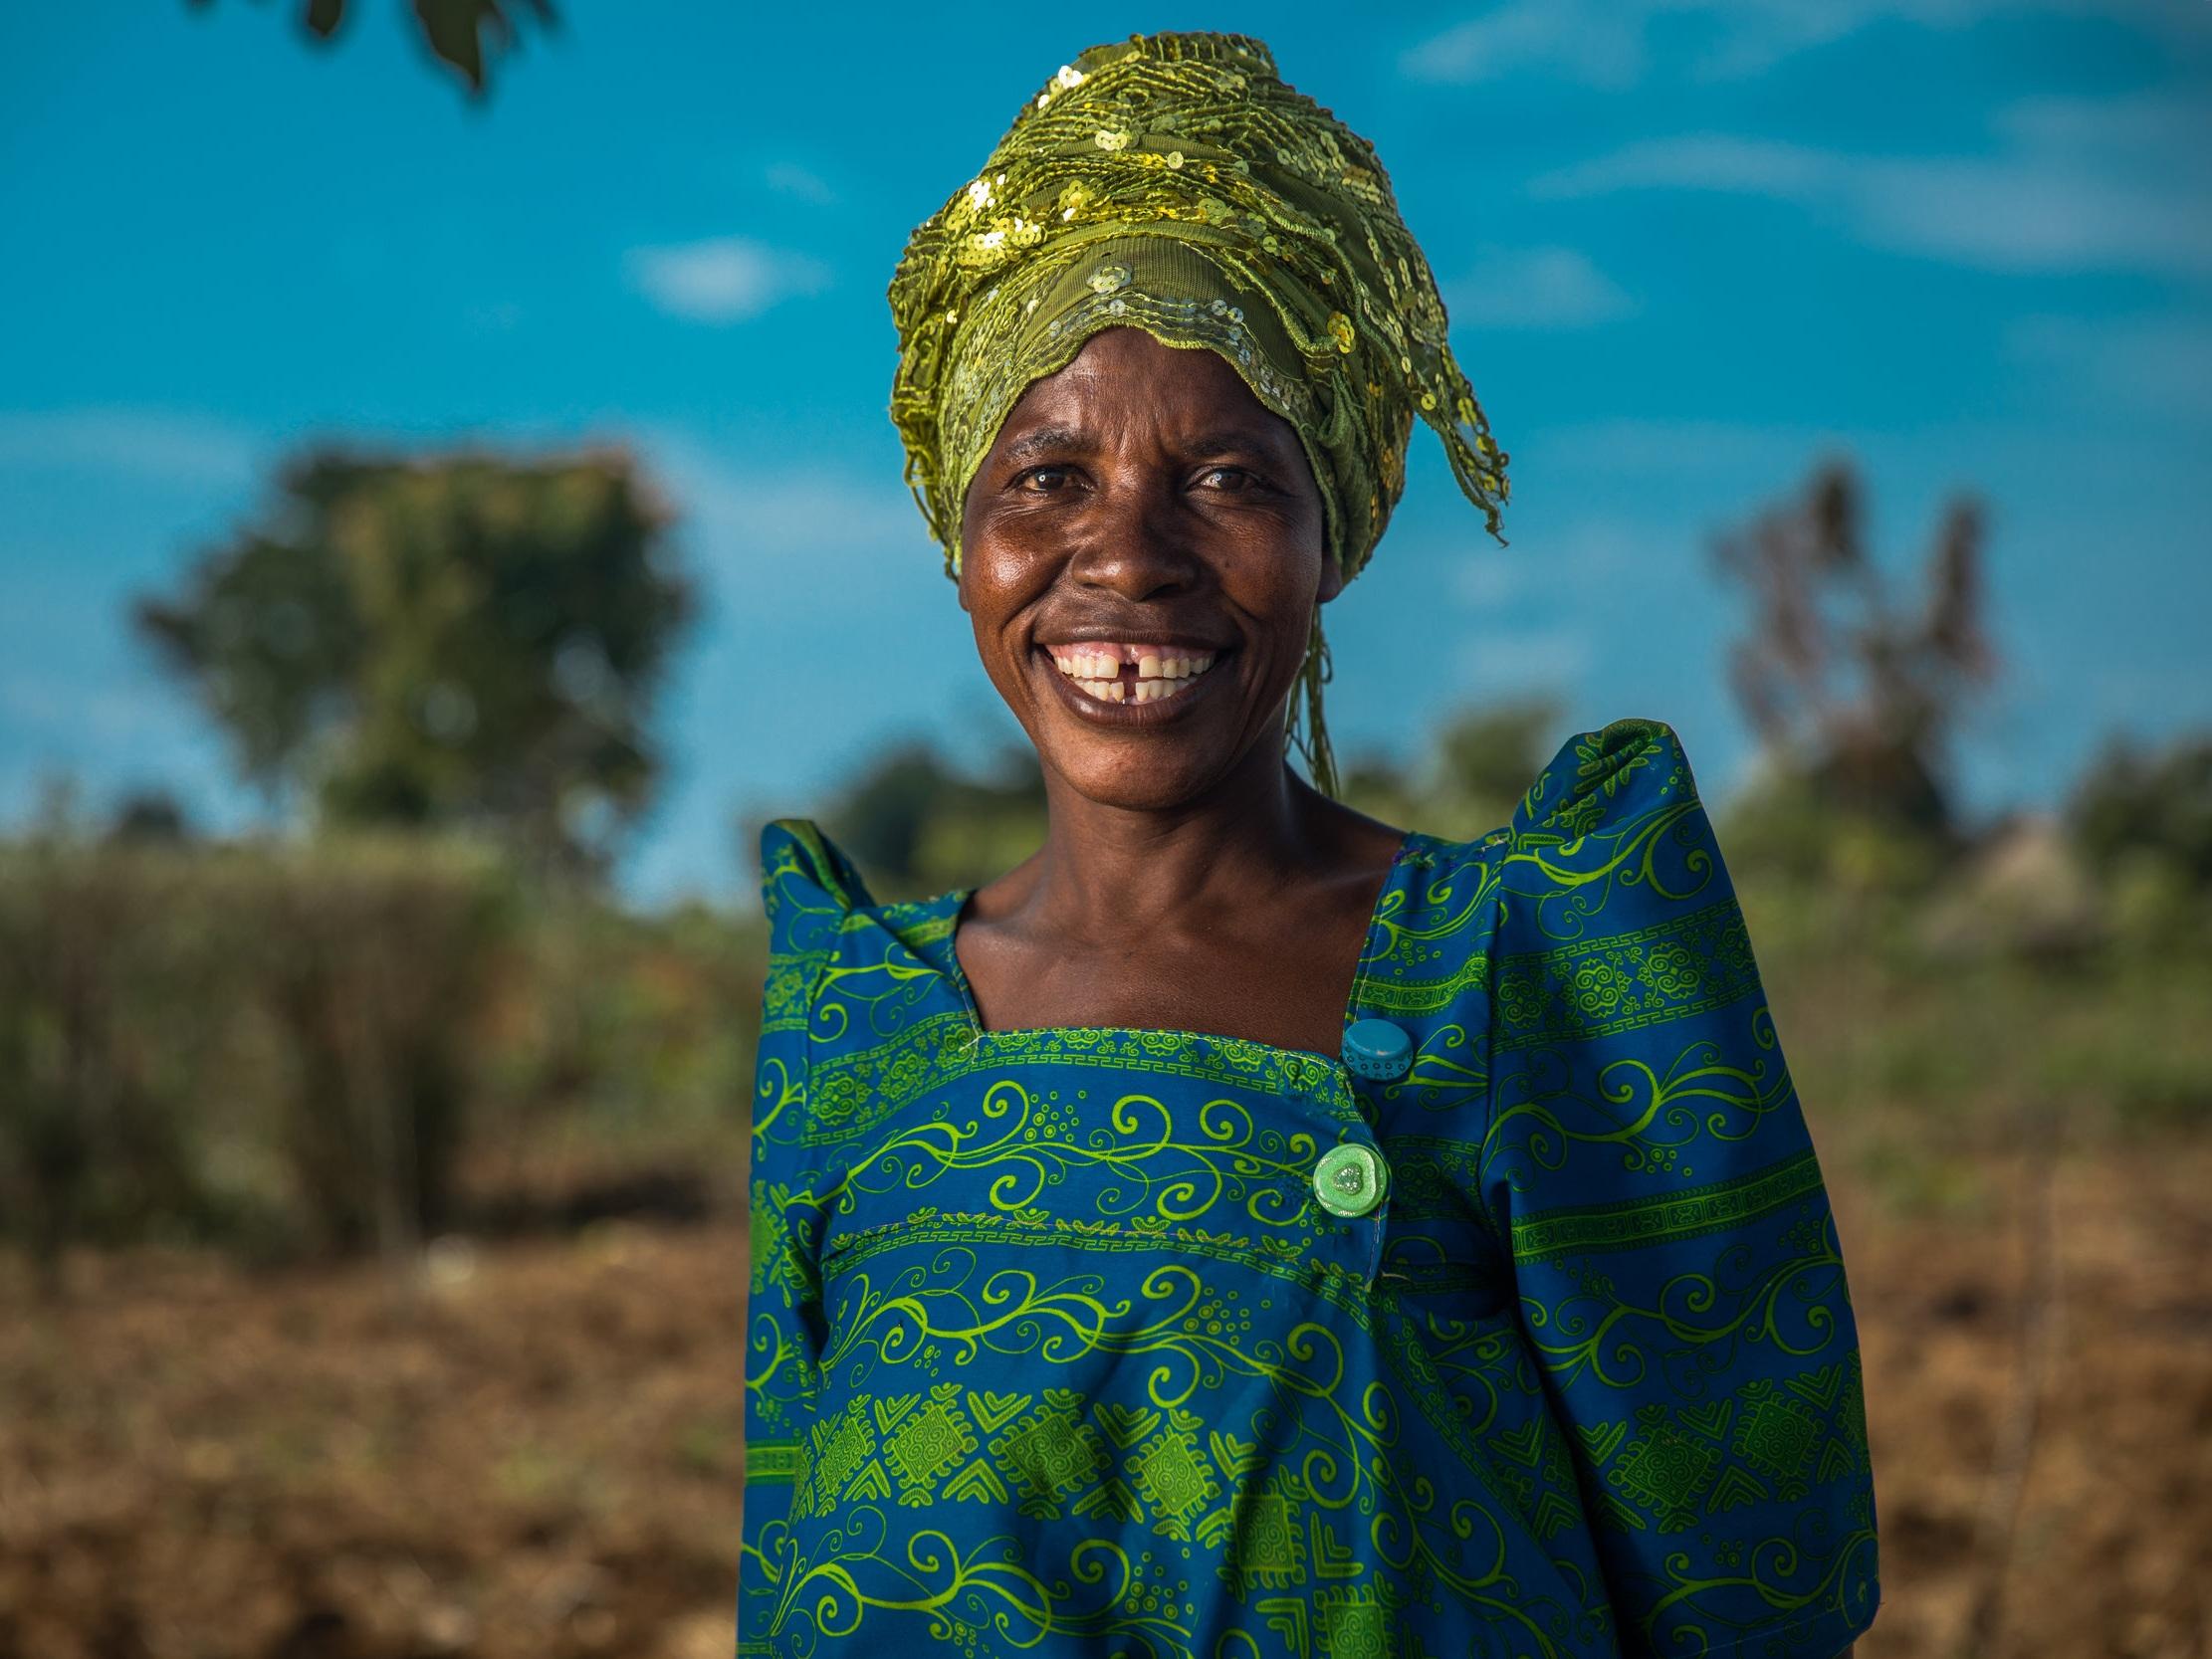 Uganda-2018-charitywater-cubbygraham-0555.jpg